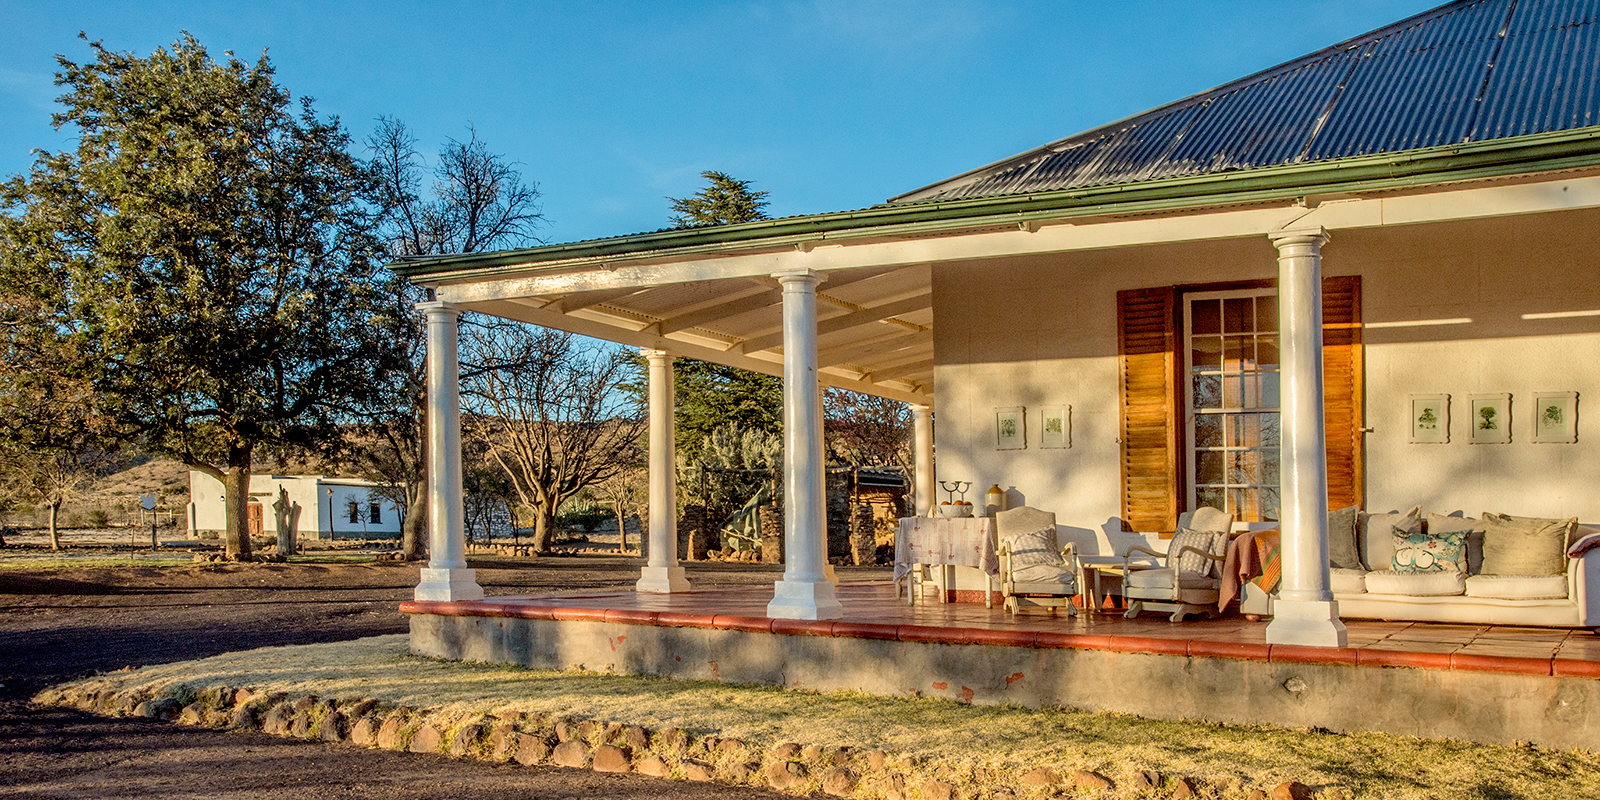 Karoo Hospitality at its Best!